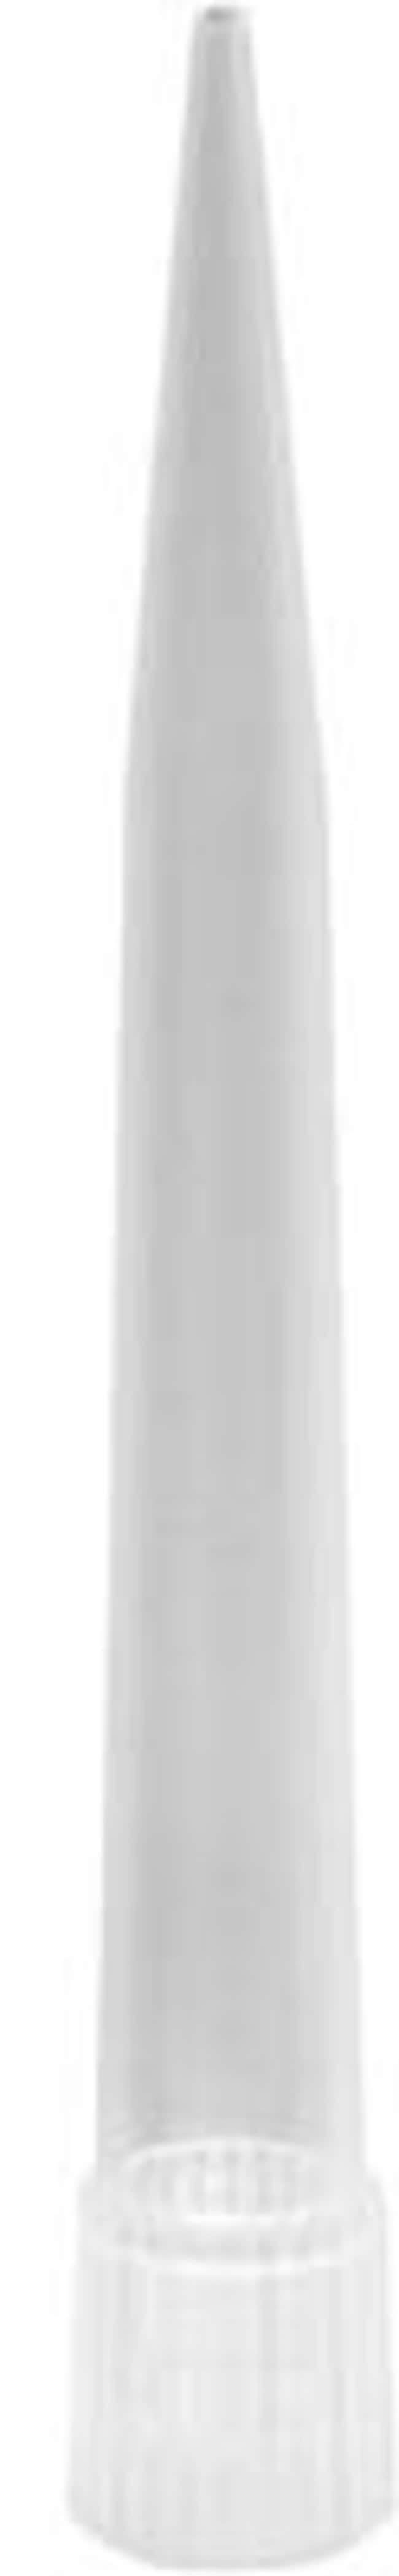 Fisherbrand™Macro-Line Pipette Tips Capacity: 1 to 5mL Fisherbrand™Macro-Line Pipette Tips